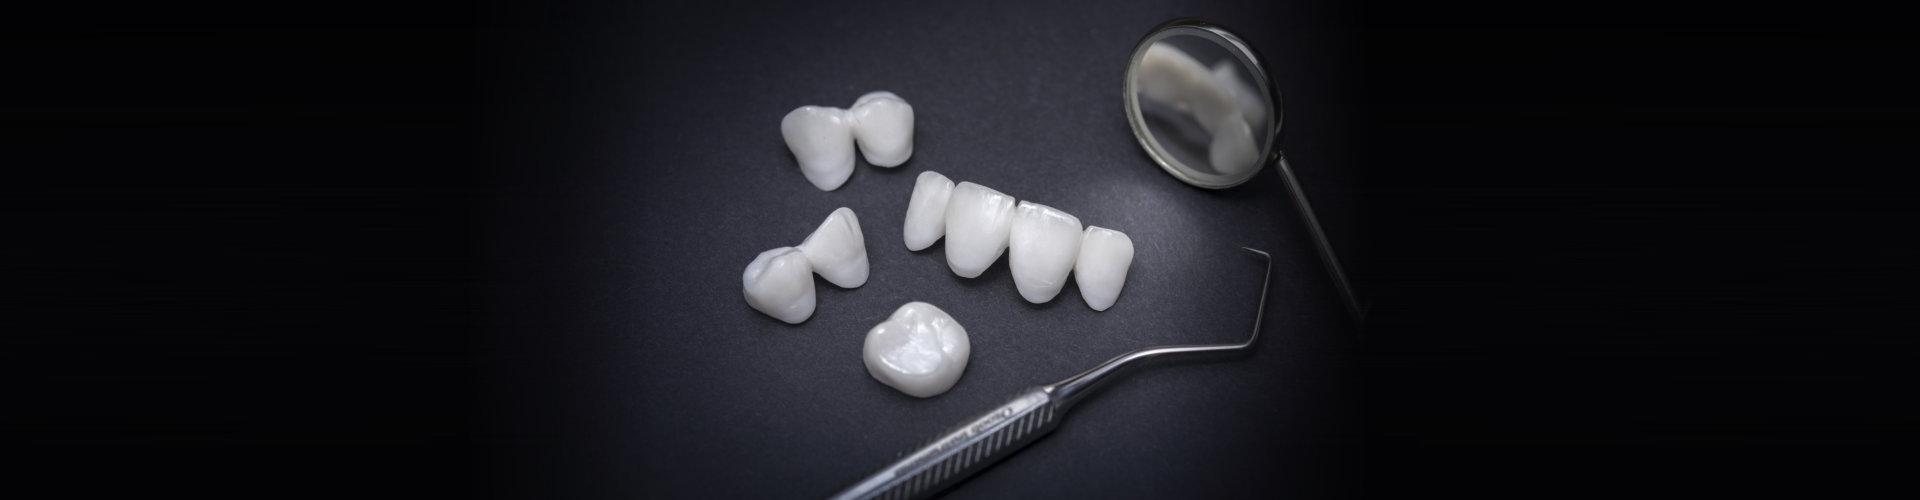 dental apparatus